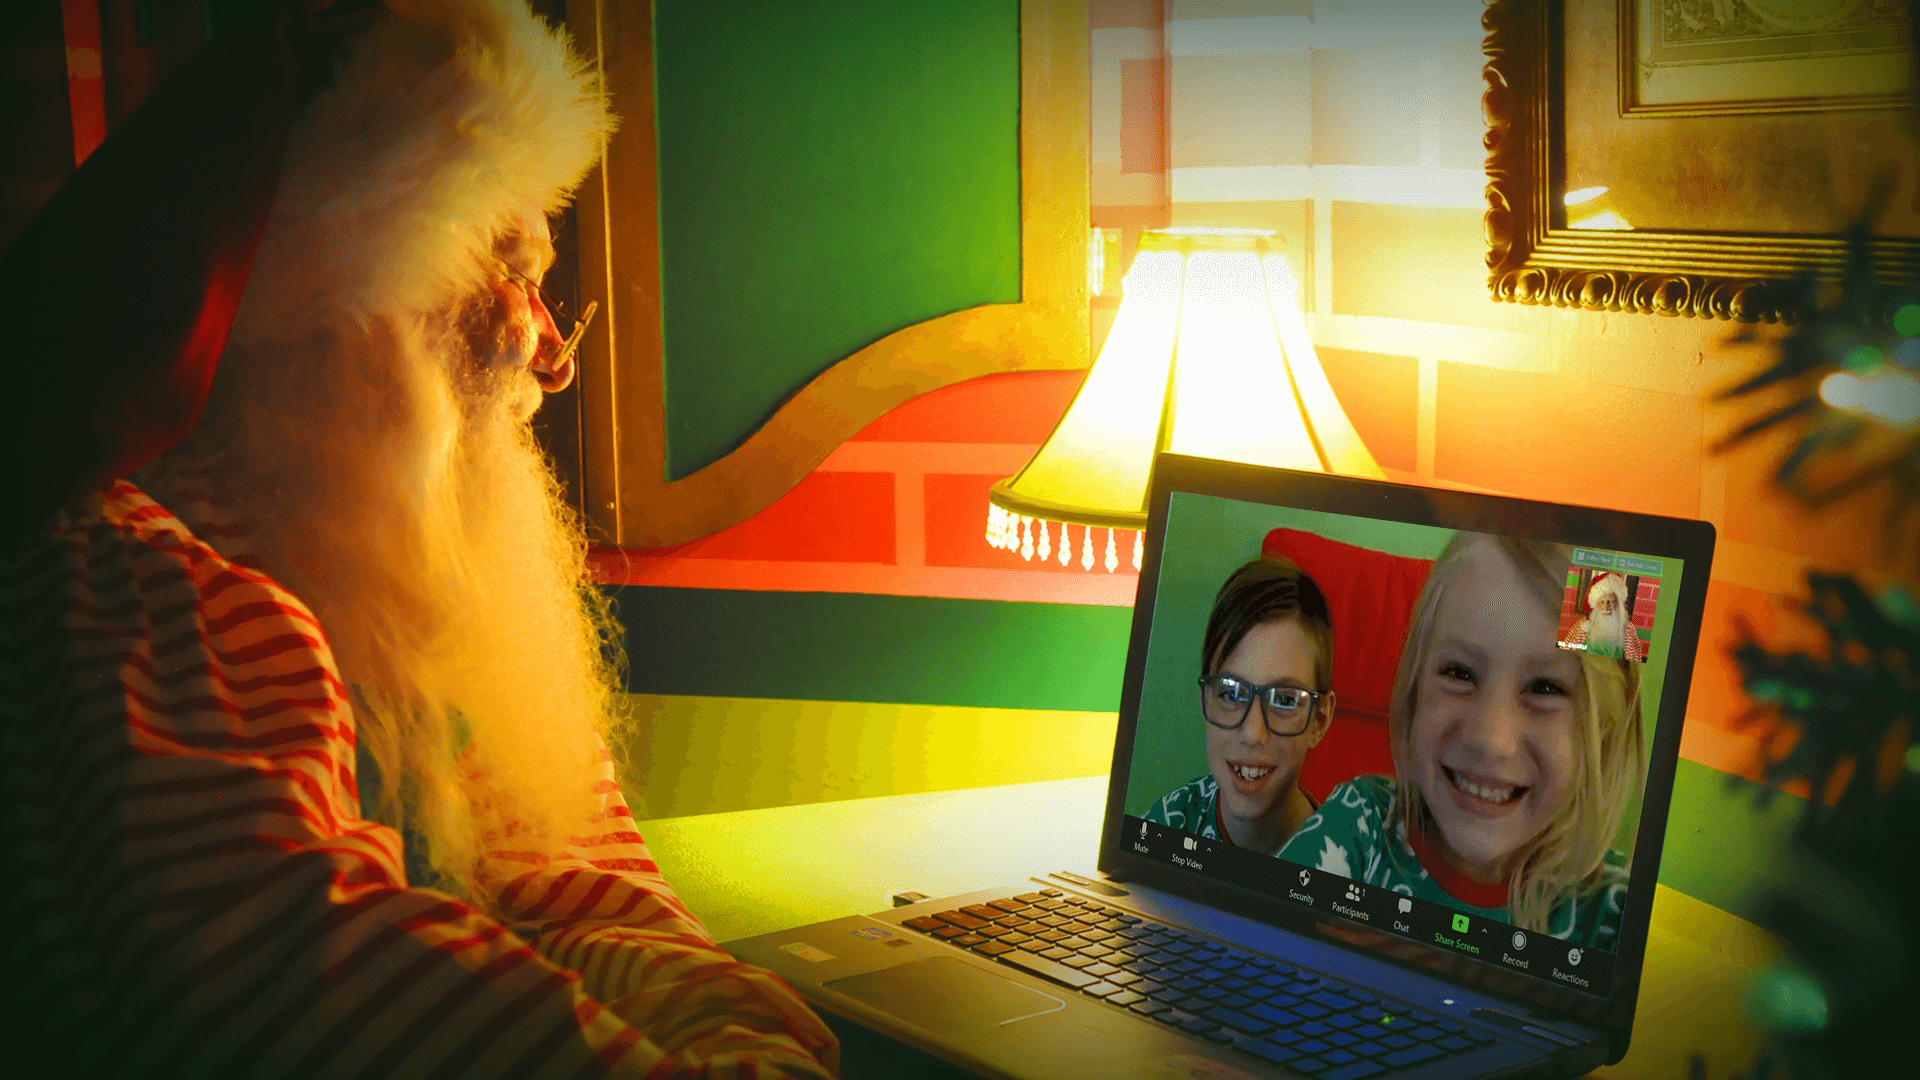 Mr. Kringle offers Virtual Santa Visits, Santa Breakfasts, Letters From Santa, and Immersive Santa Experiences!